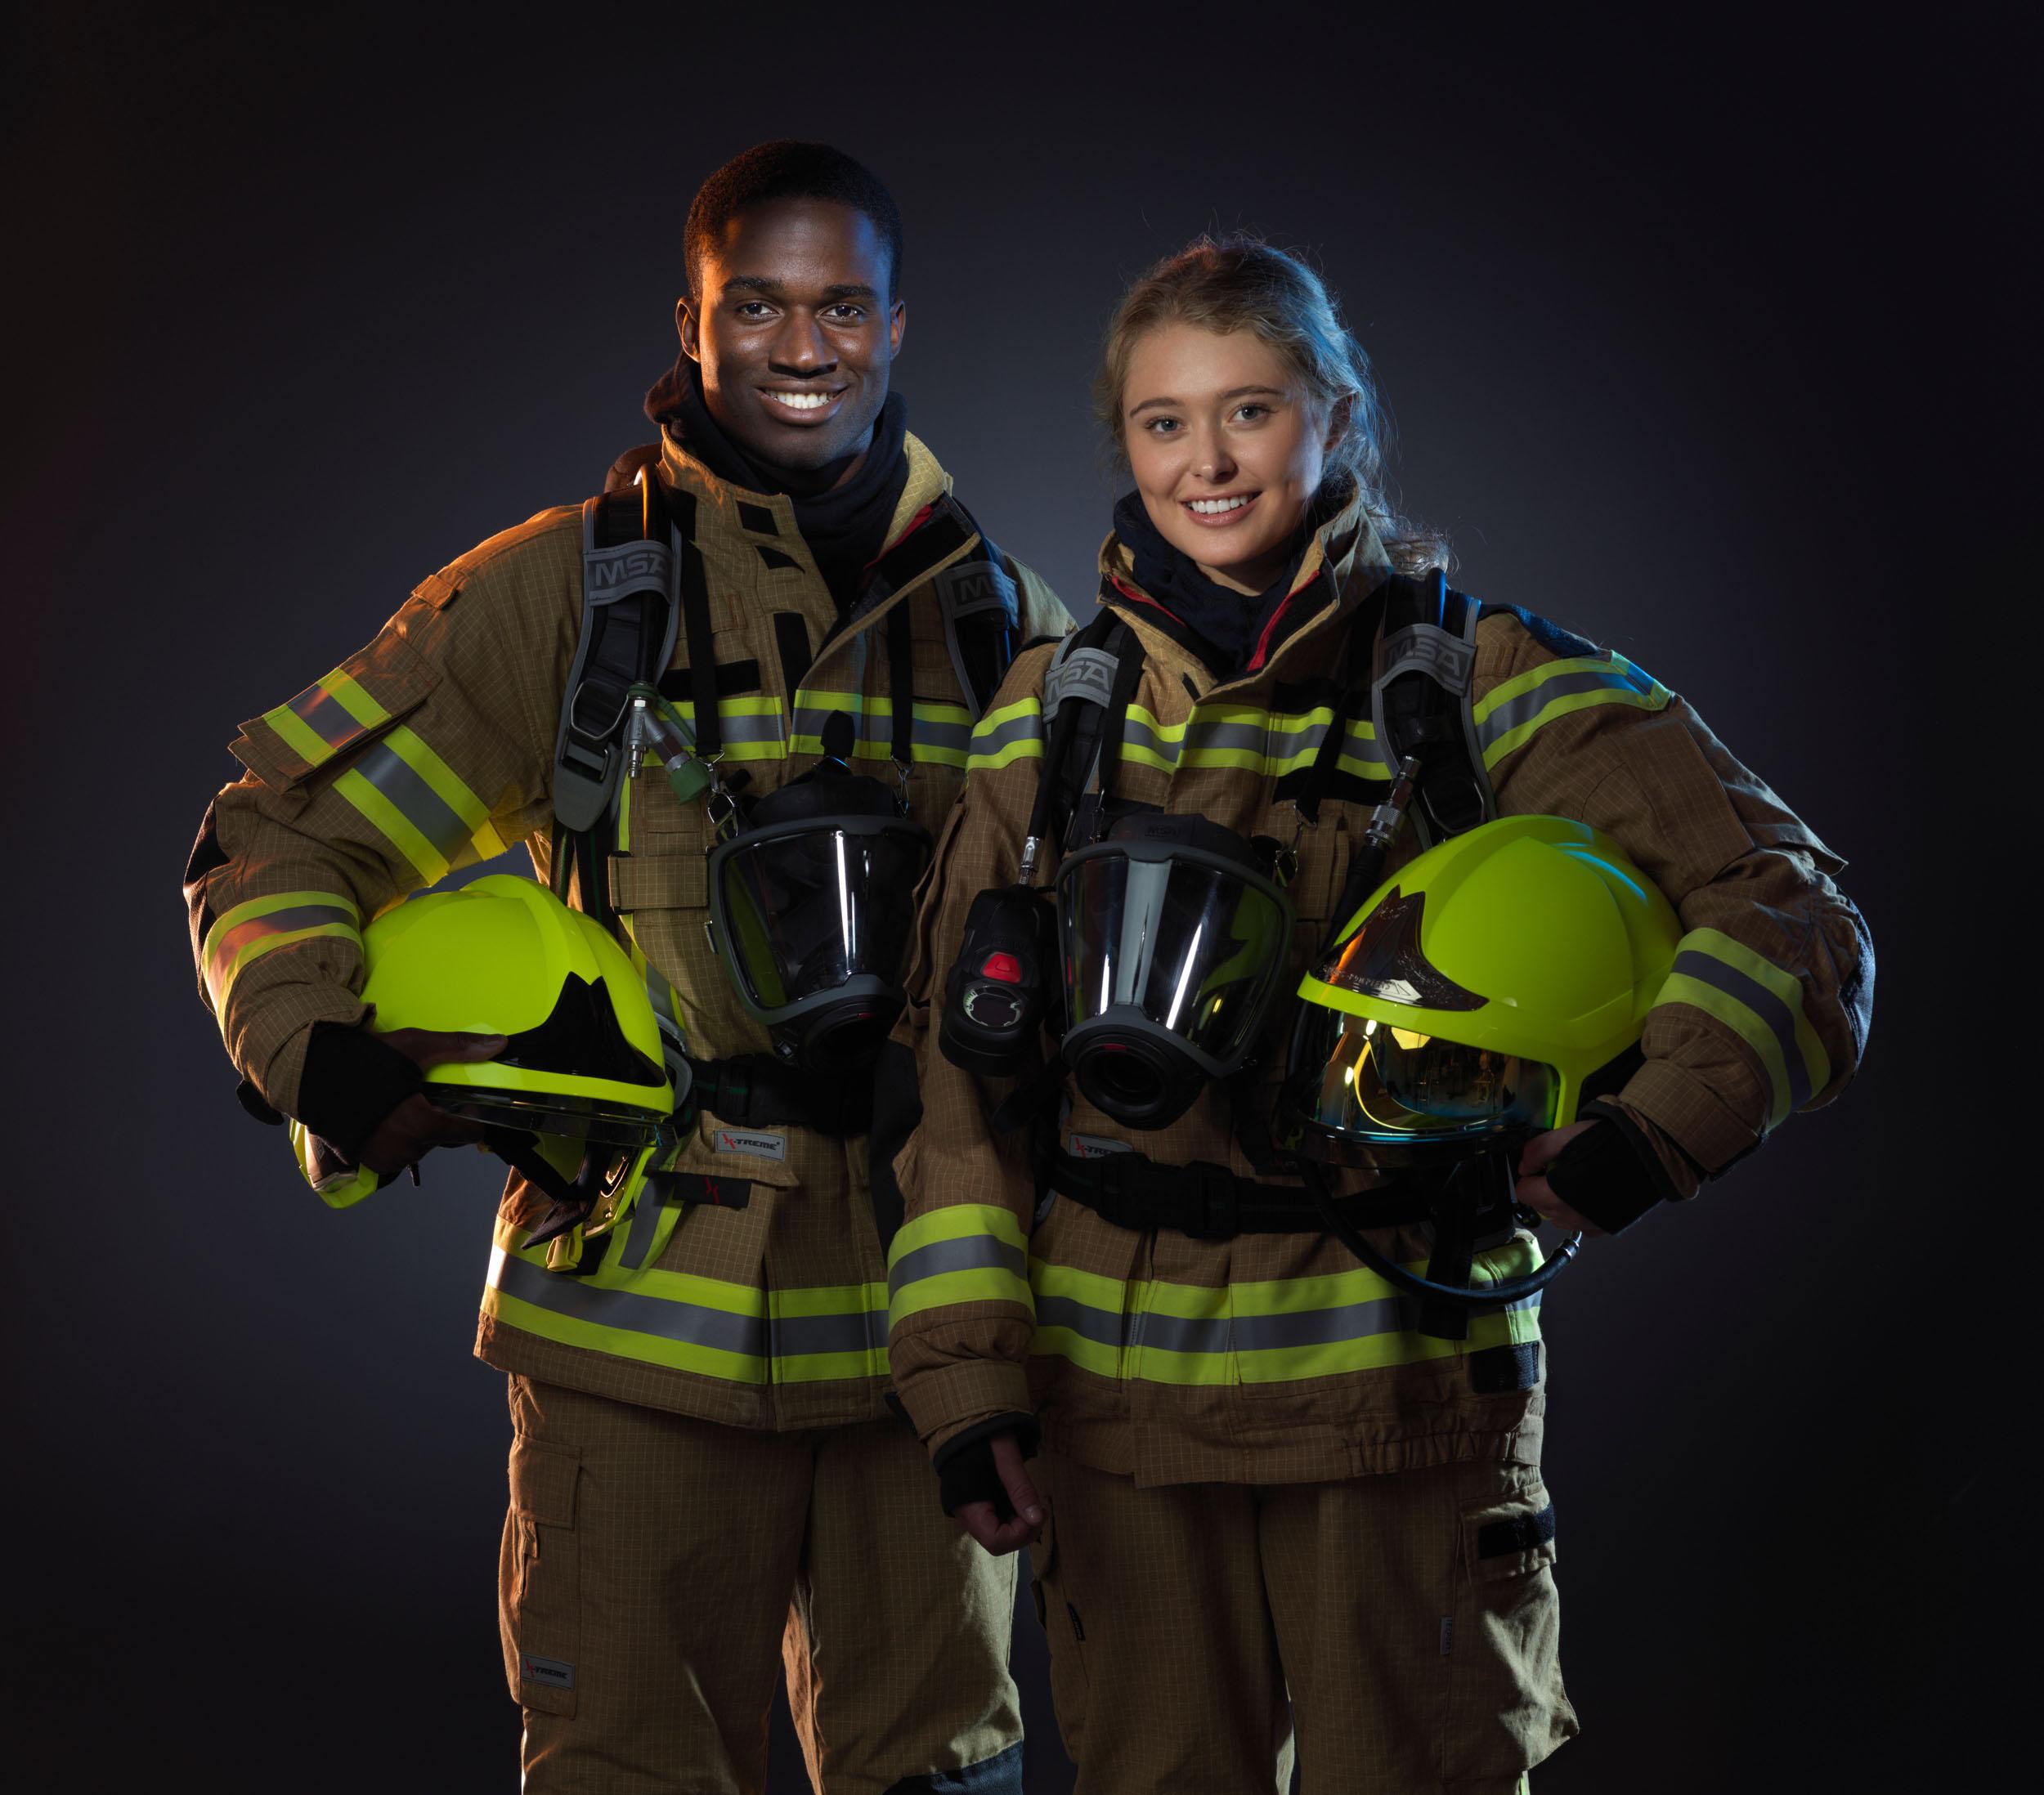 FireMan&woman_SS.jpg